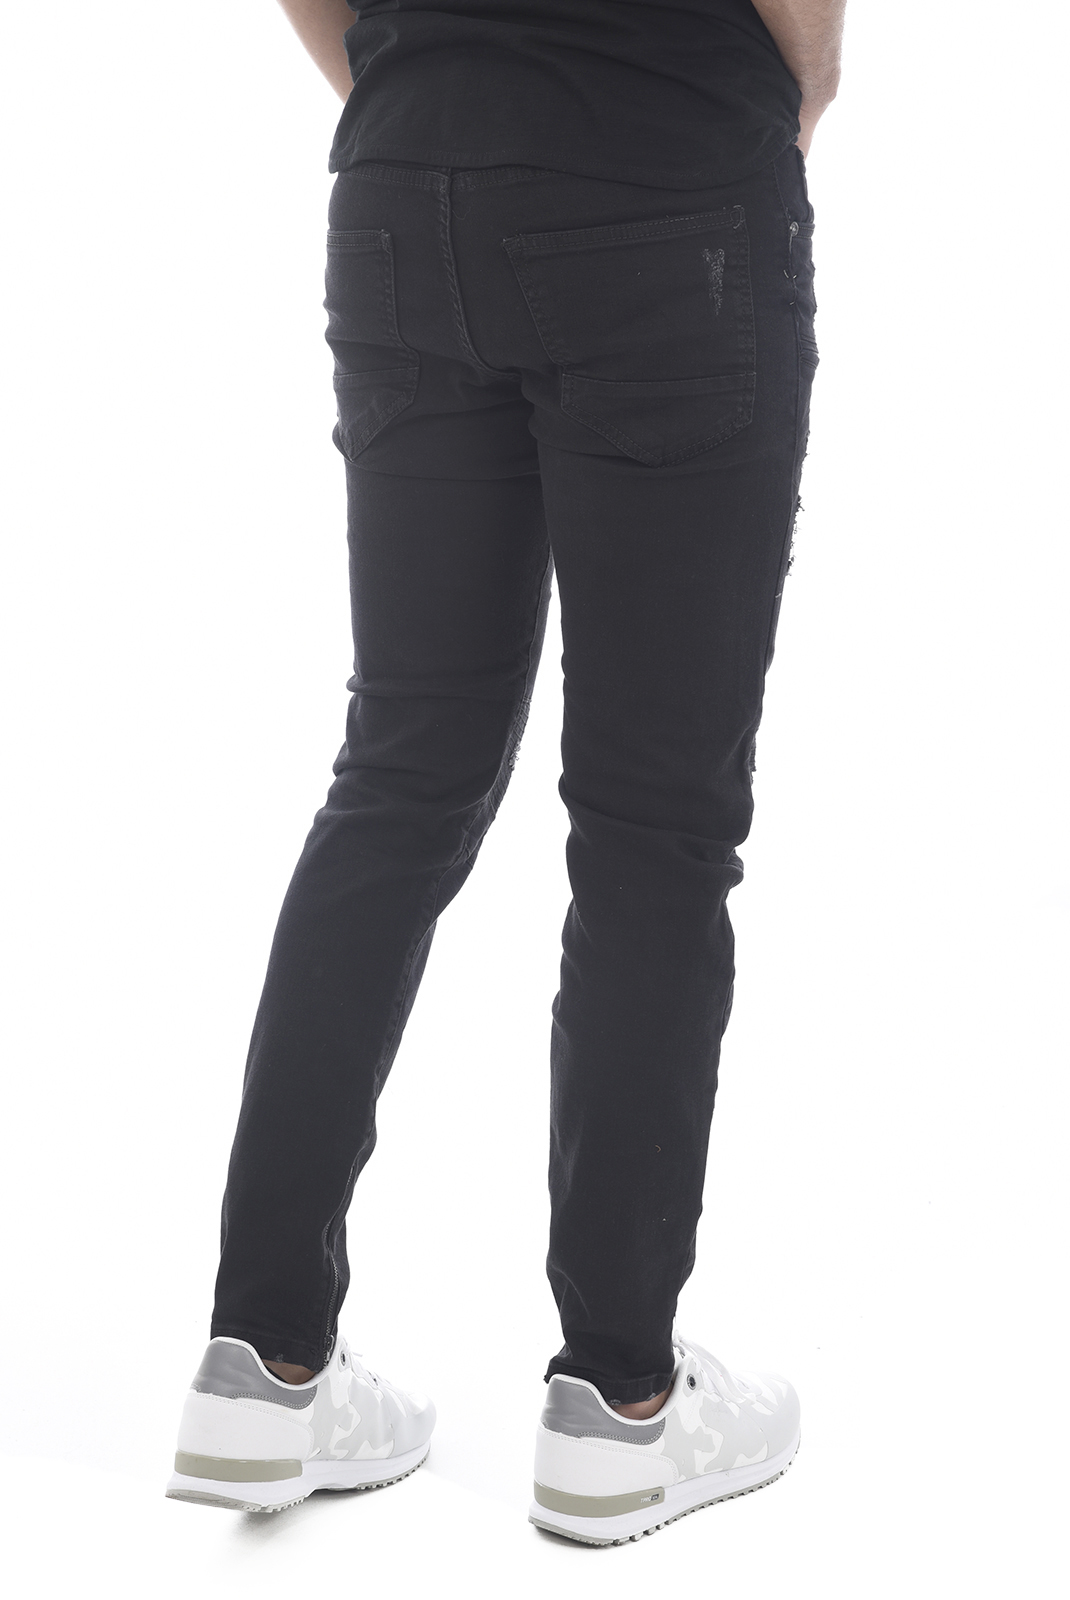 Jeans  George v GV105 BLACK